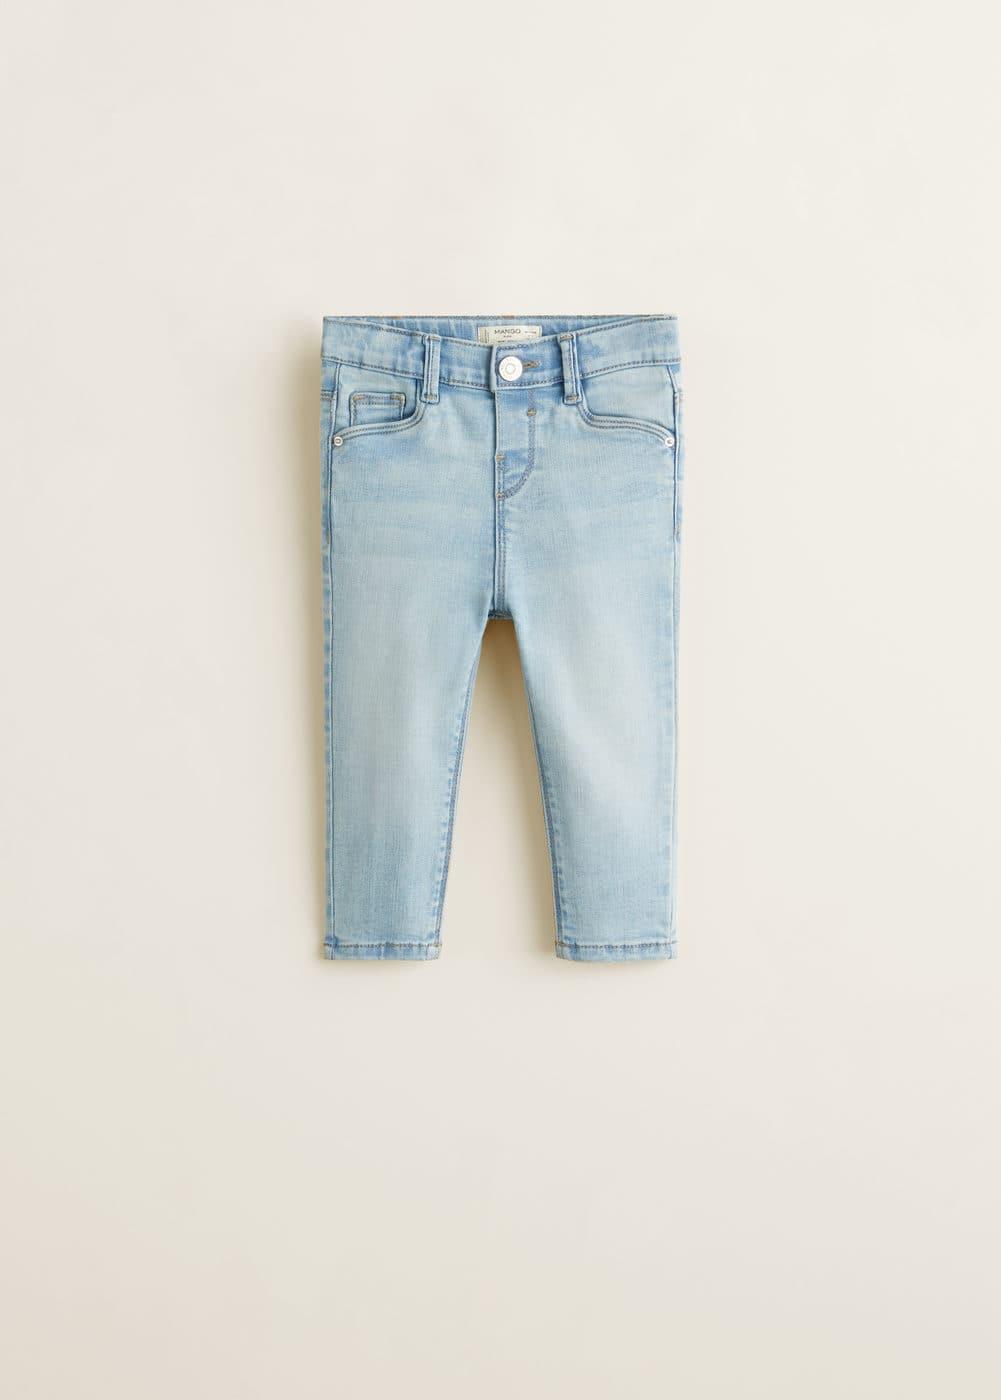 Mango - Slim Fit Jeans - 1